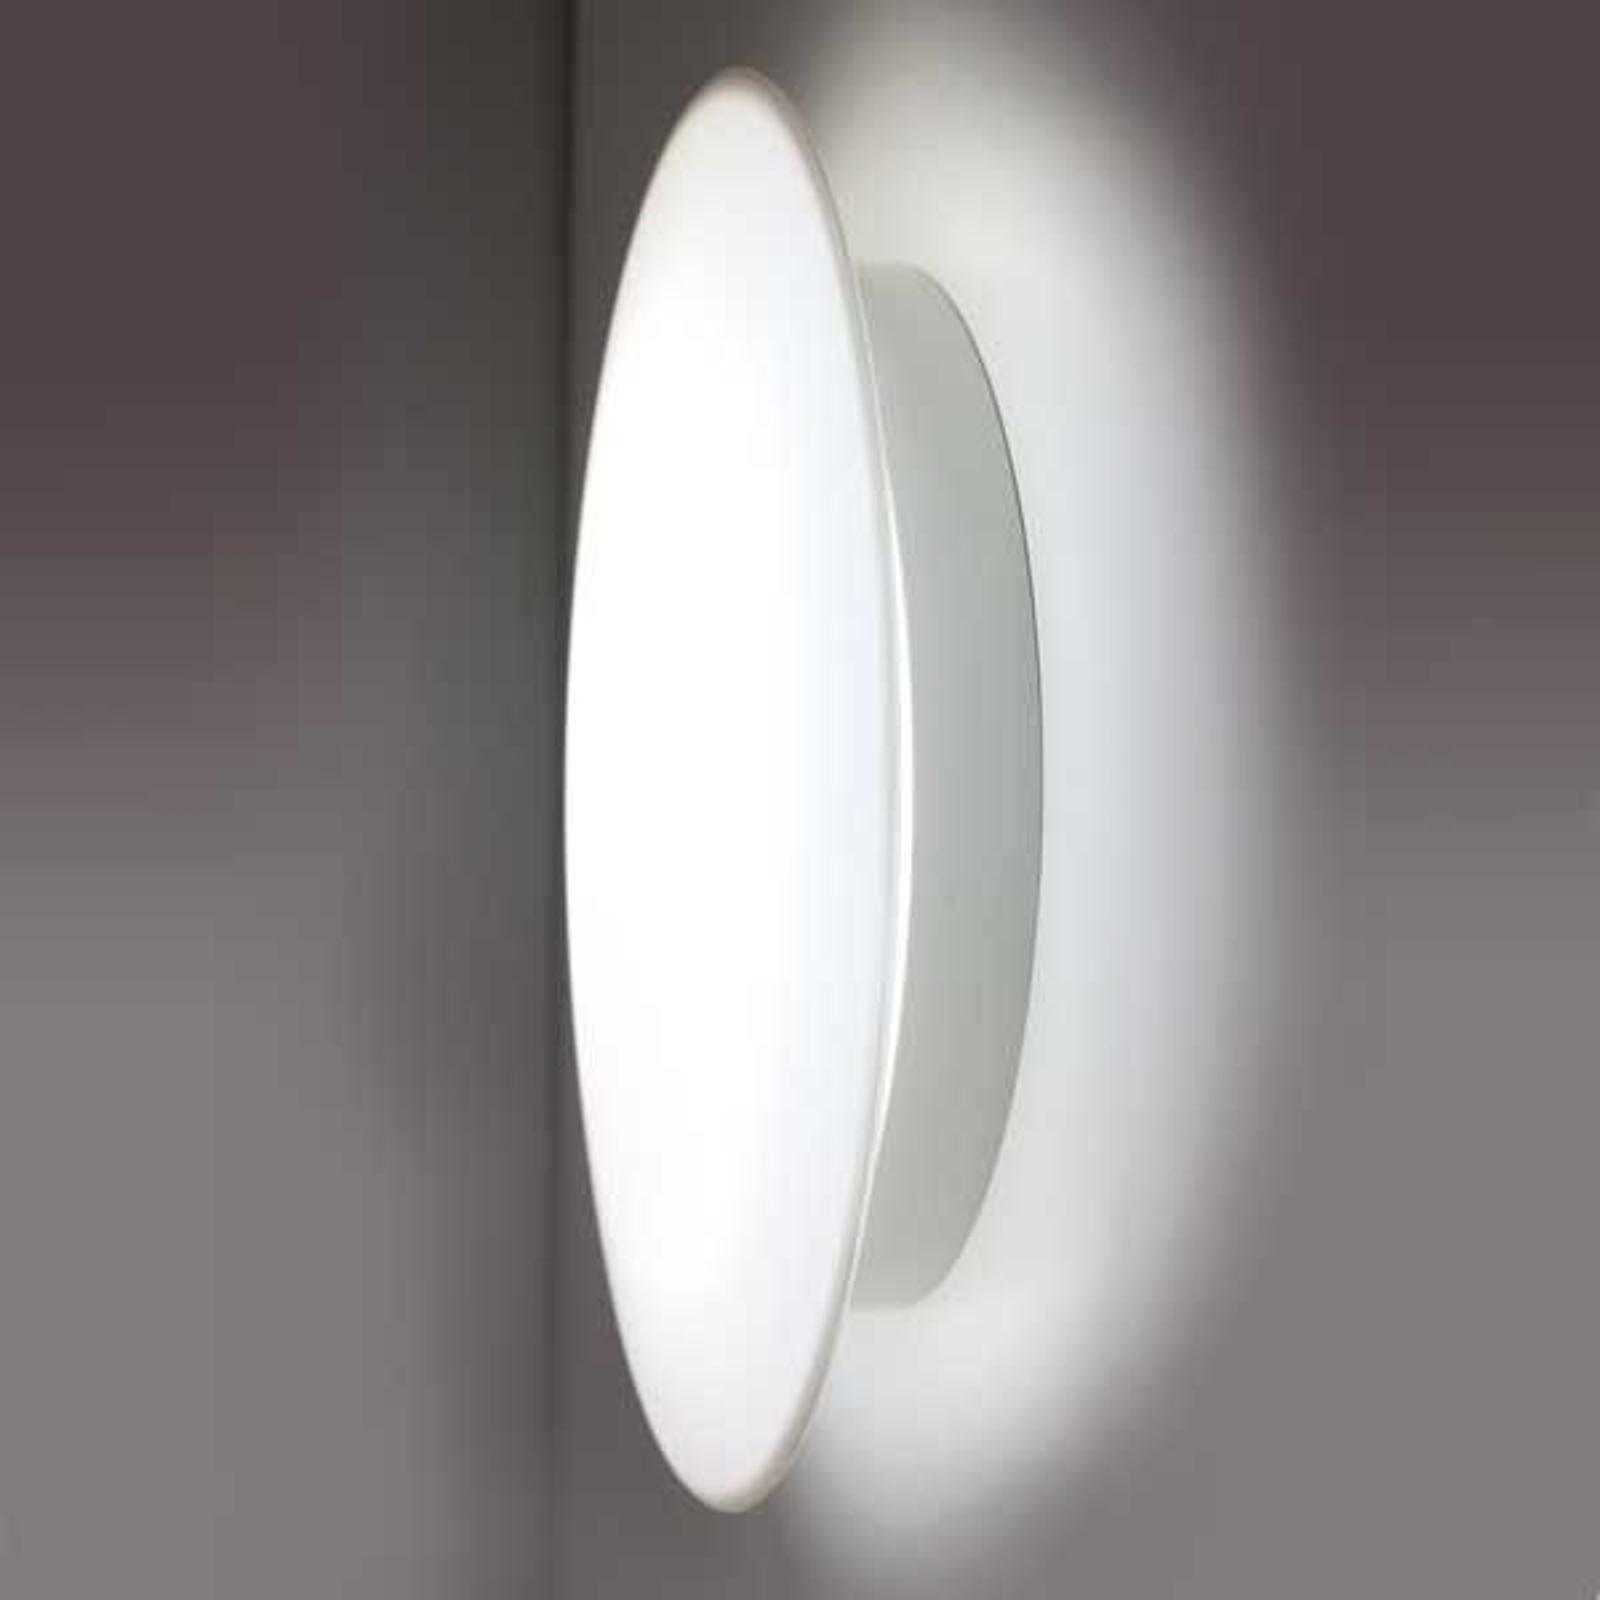 SUN 3 LED-lamp van de toekomst wit 8 W 3 K